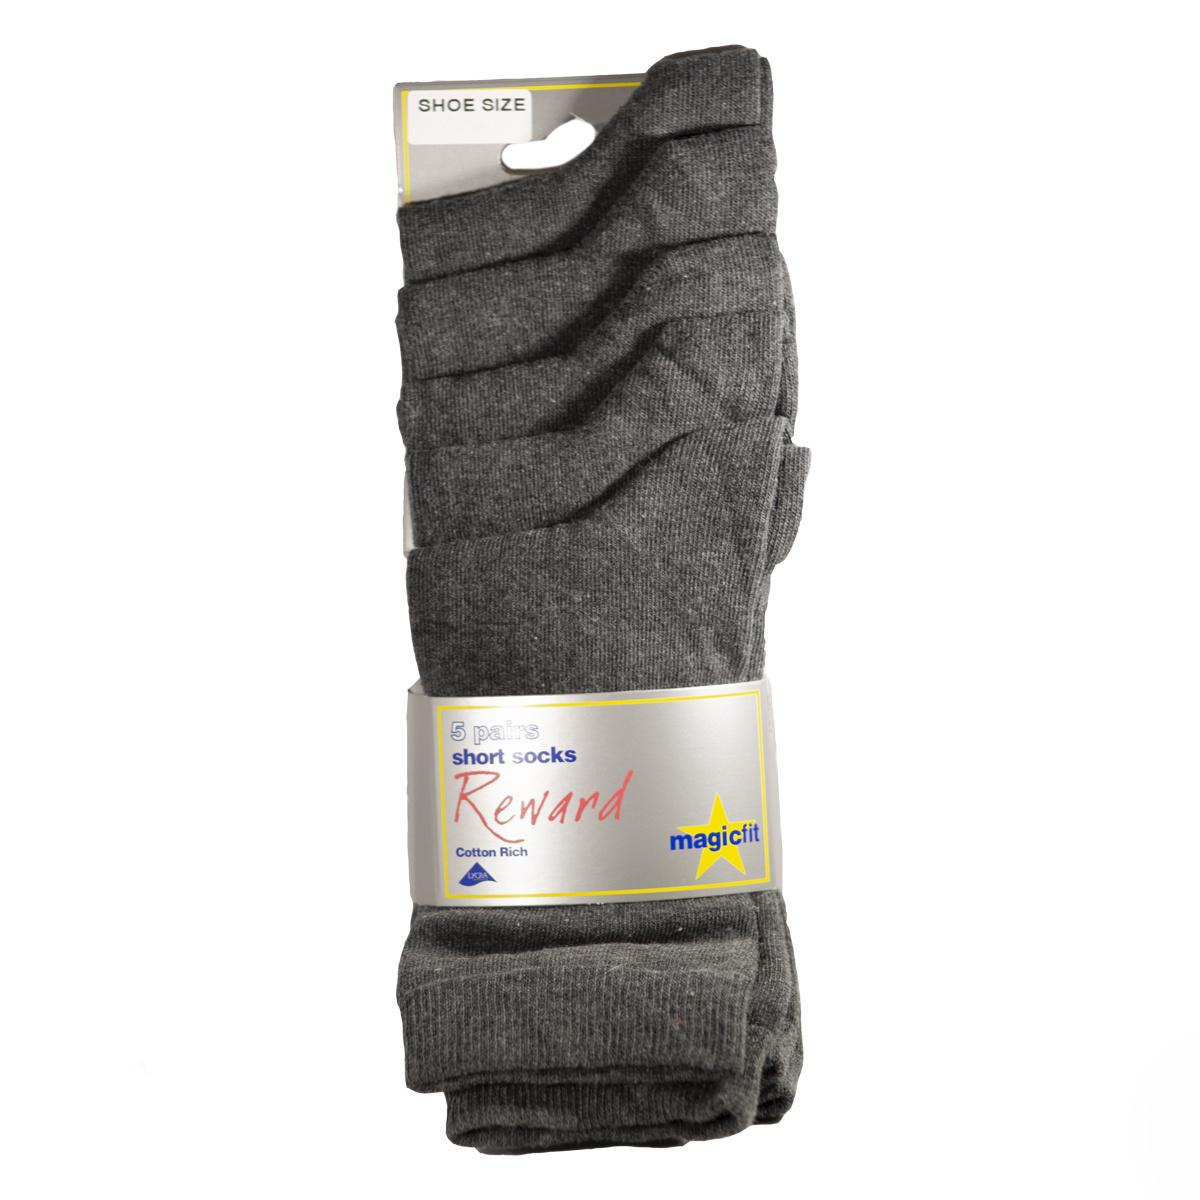 Adult Short Socks Size 7-11